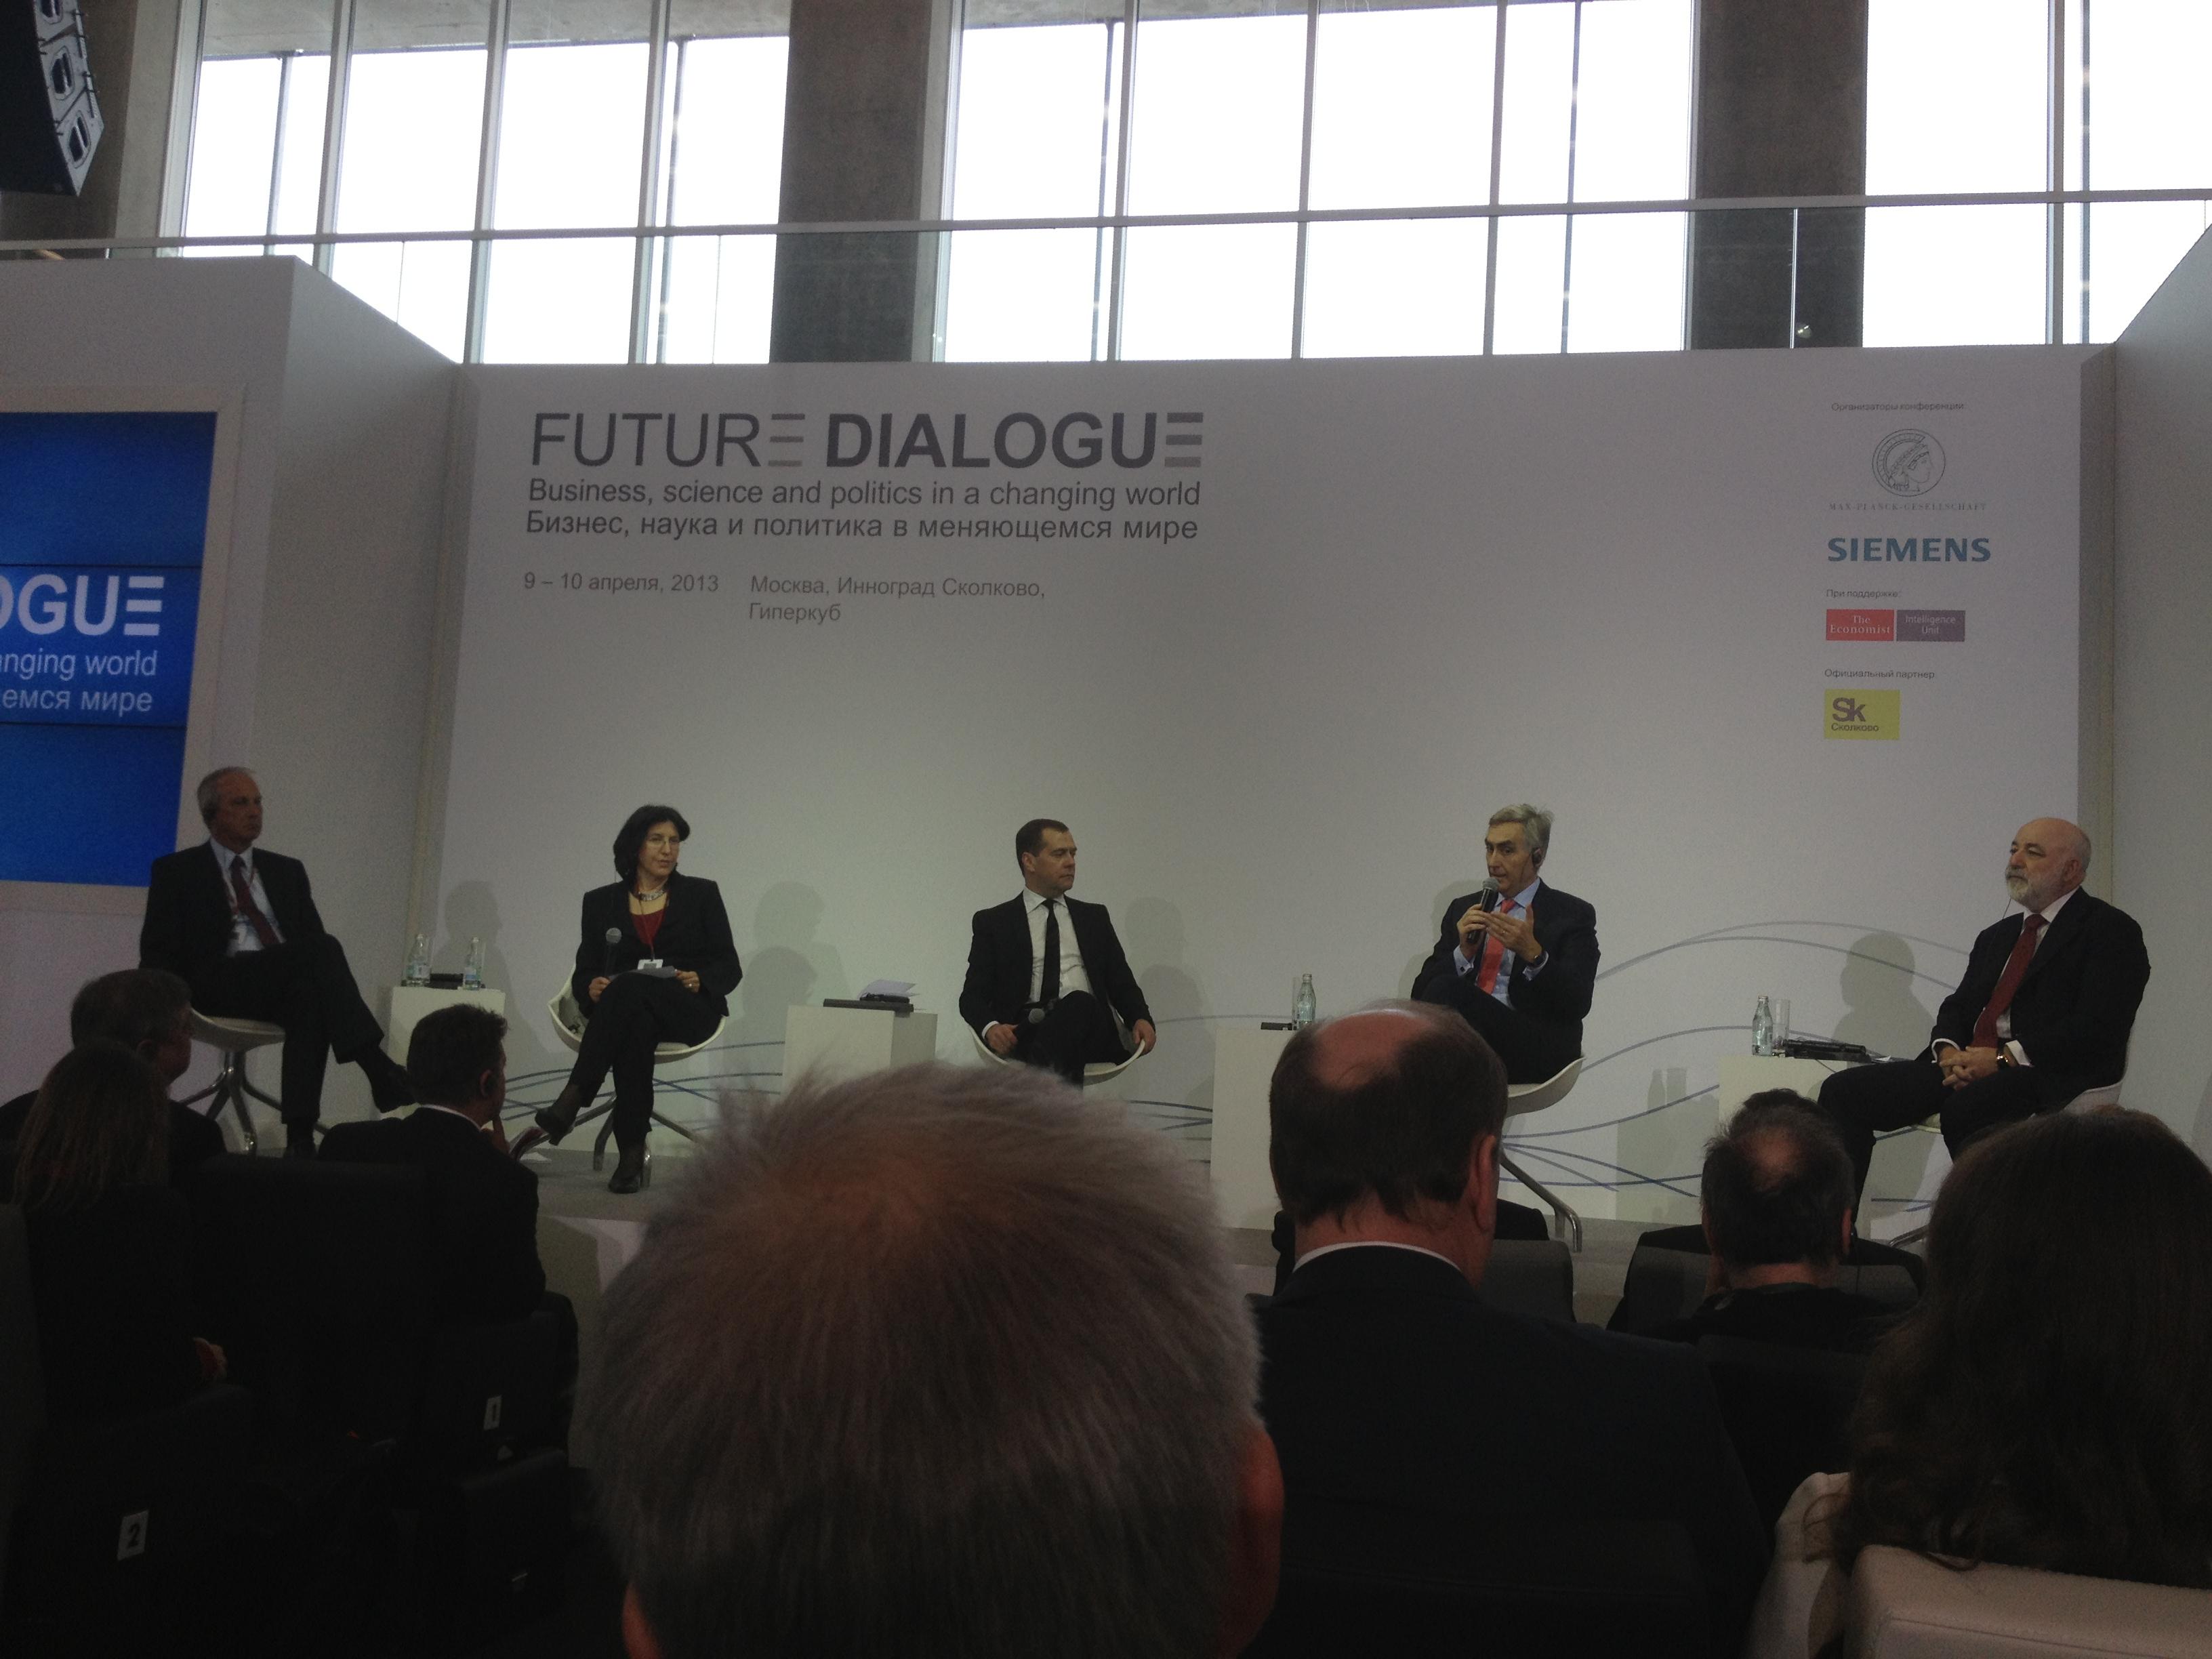 Future Dialogue in Skolkovo: Autonomy, Brains, Capital